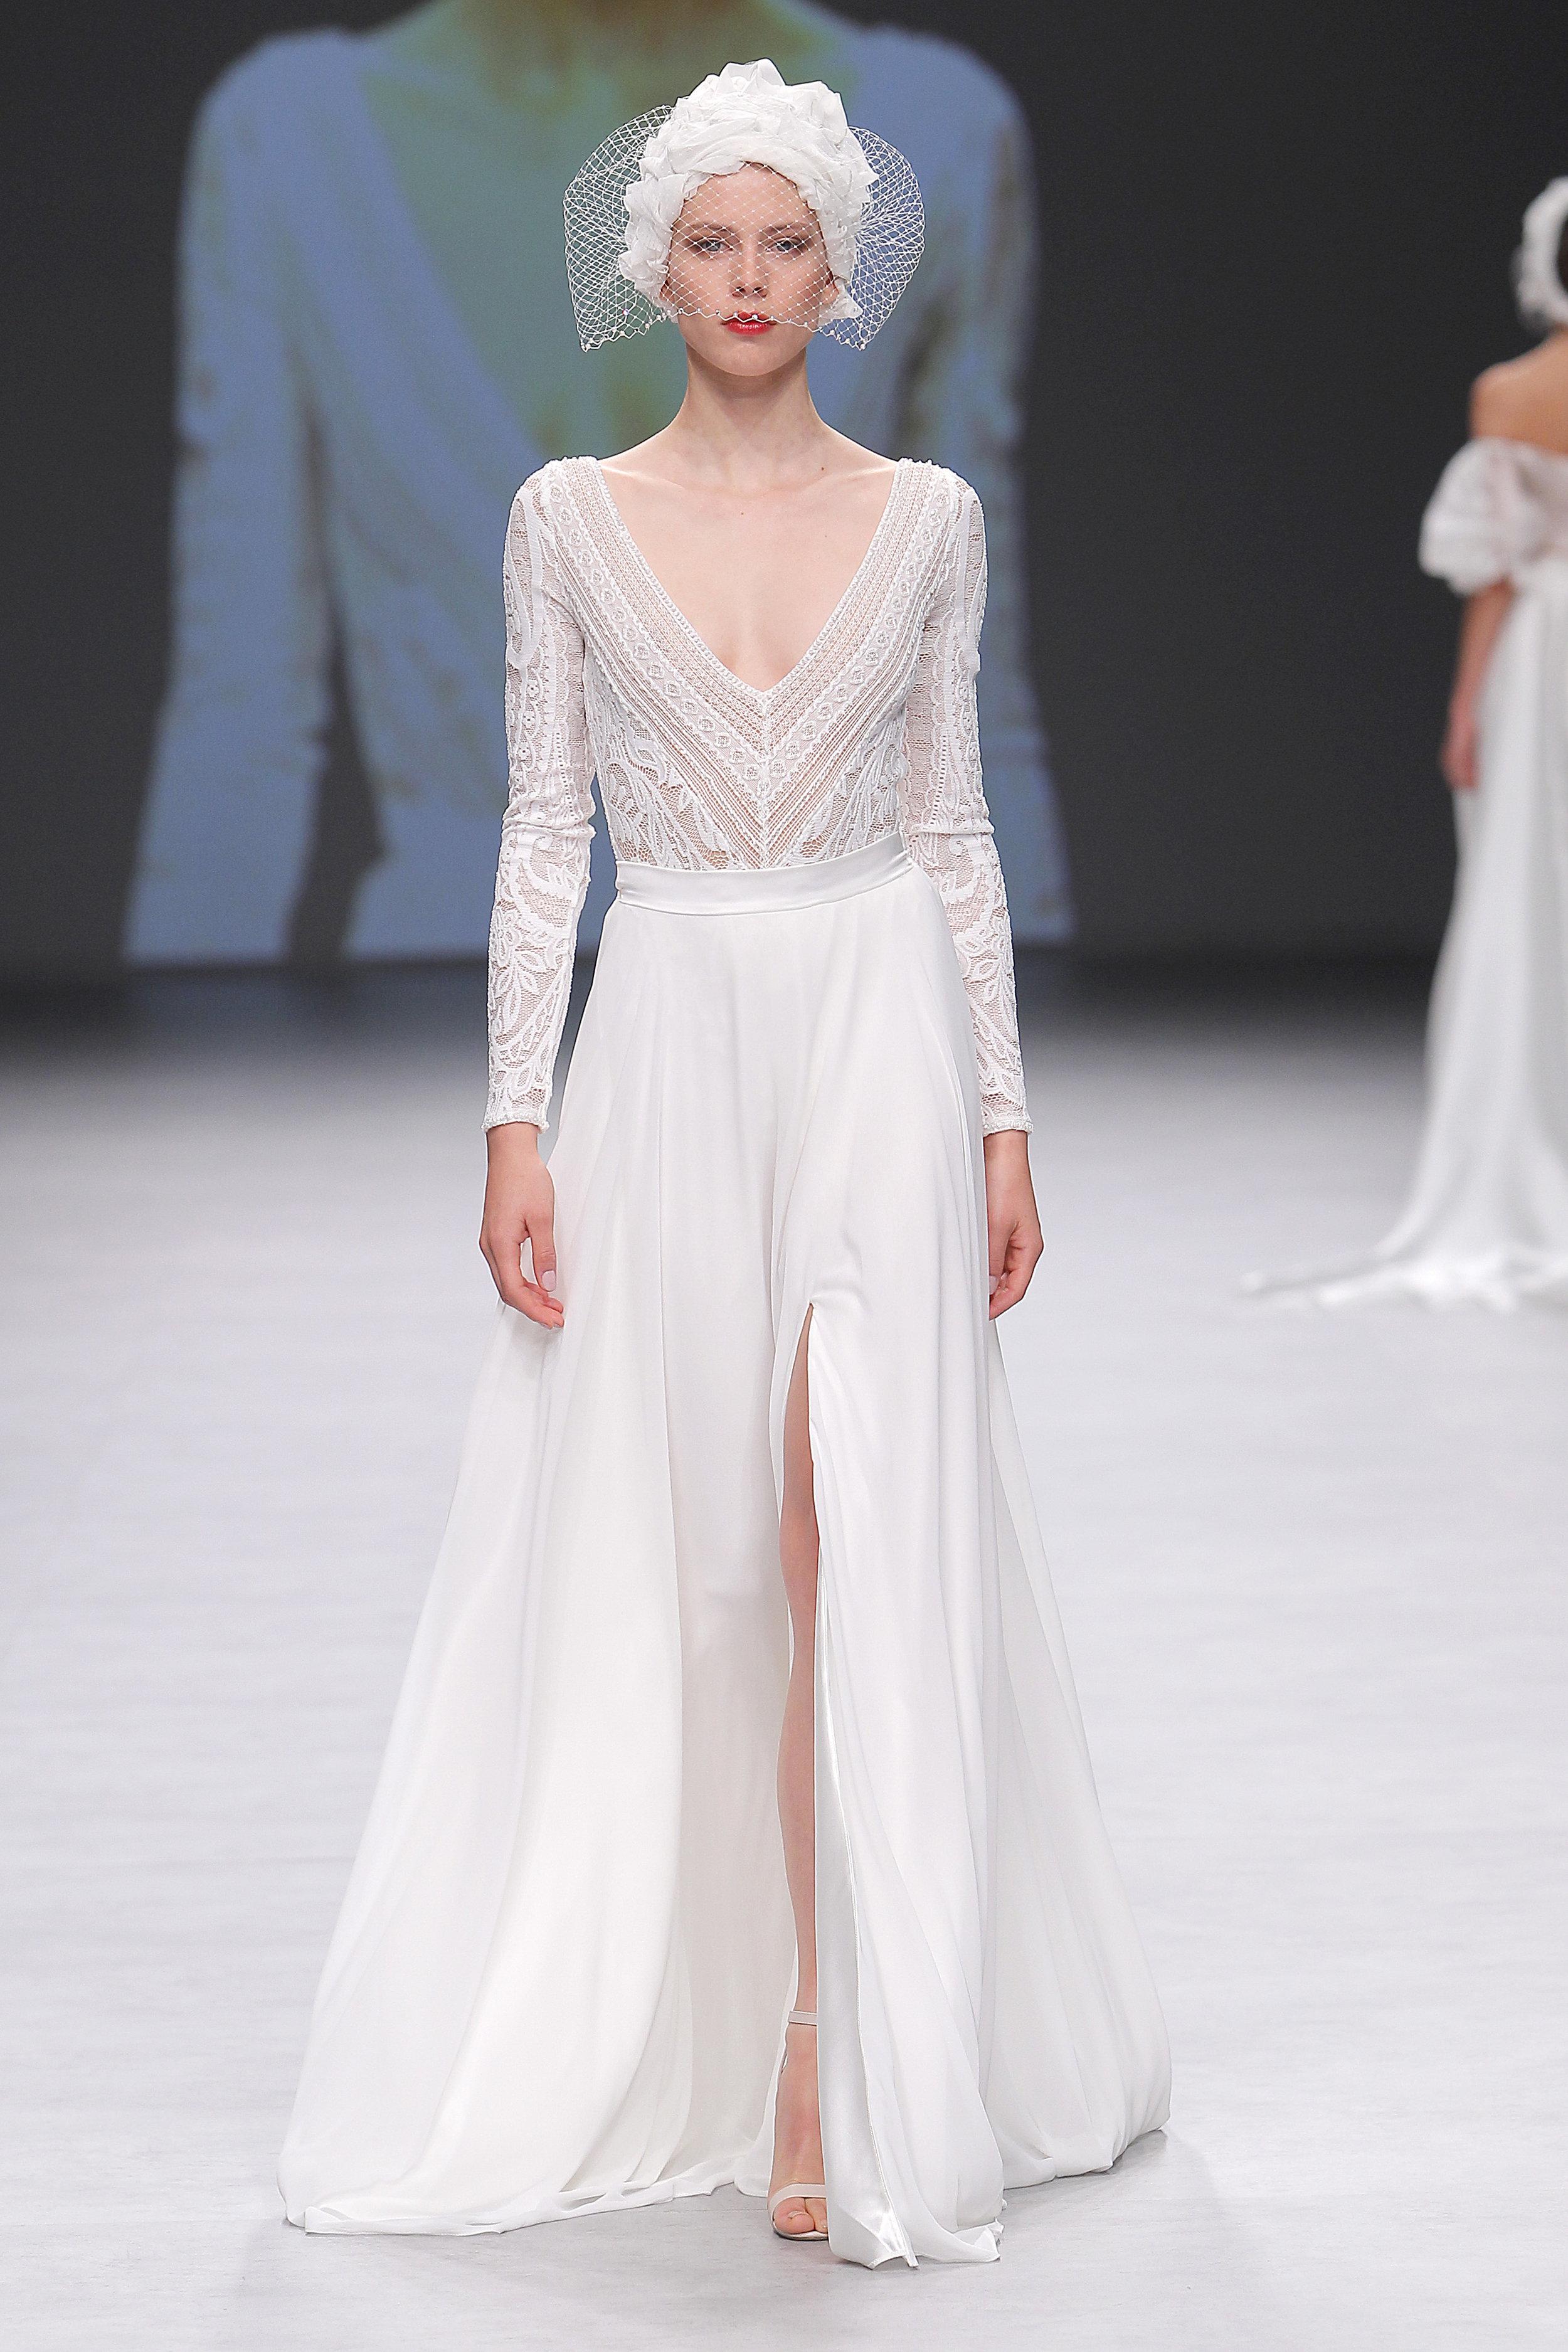 Diseñador: Flora - Pasarela:  Valmont Barcelona Bridal Fashion Week